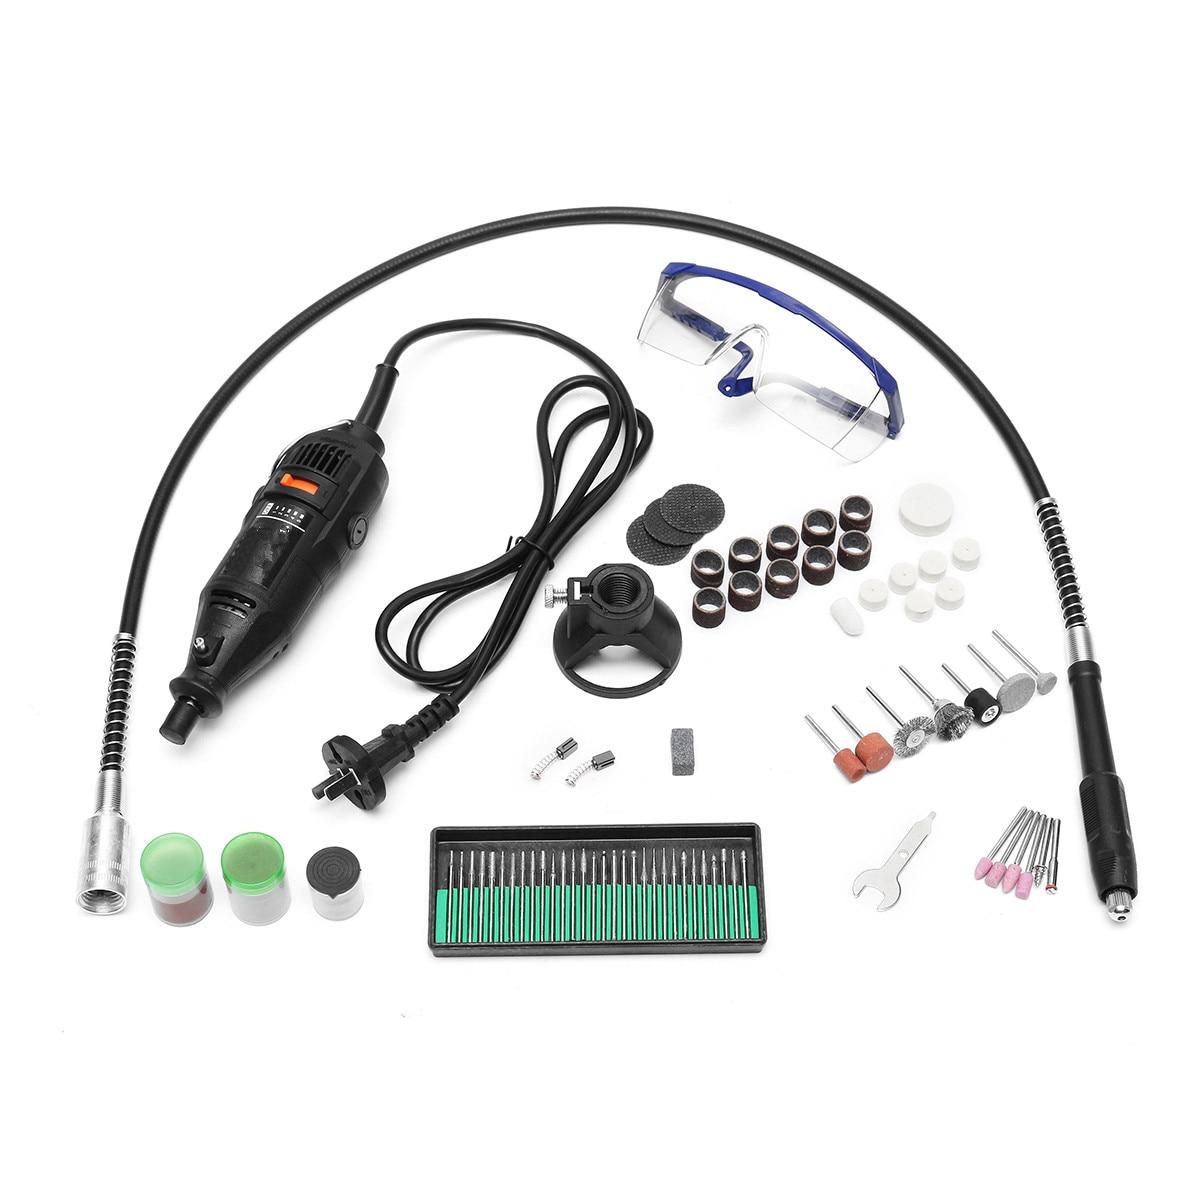 114Pcs/Set Mini Electric Drill 5 Variable Position Speed Dremel Rotary Grinder Machine Polishing Sanding Tool Accessories Kit